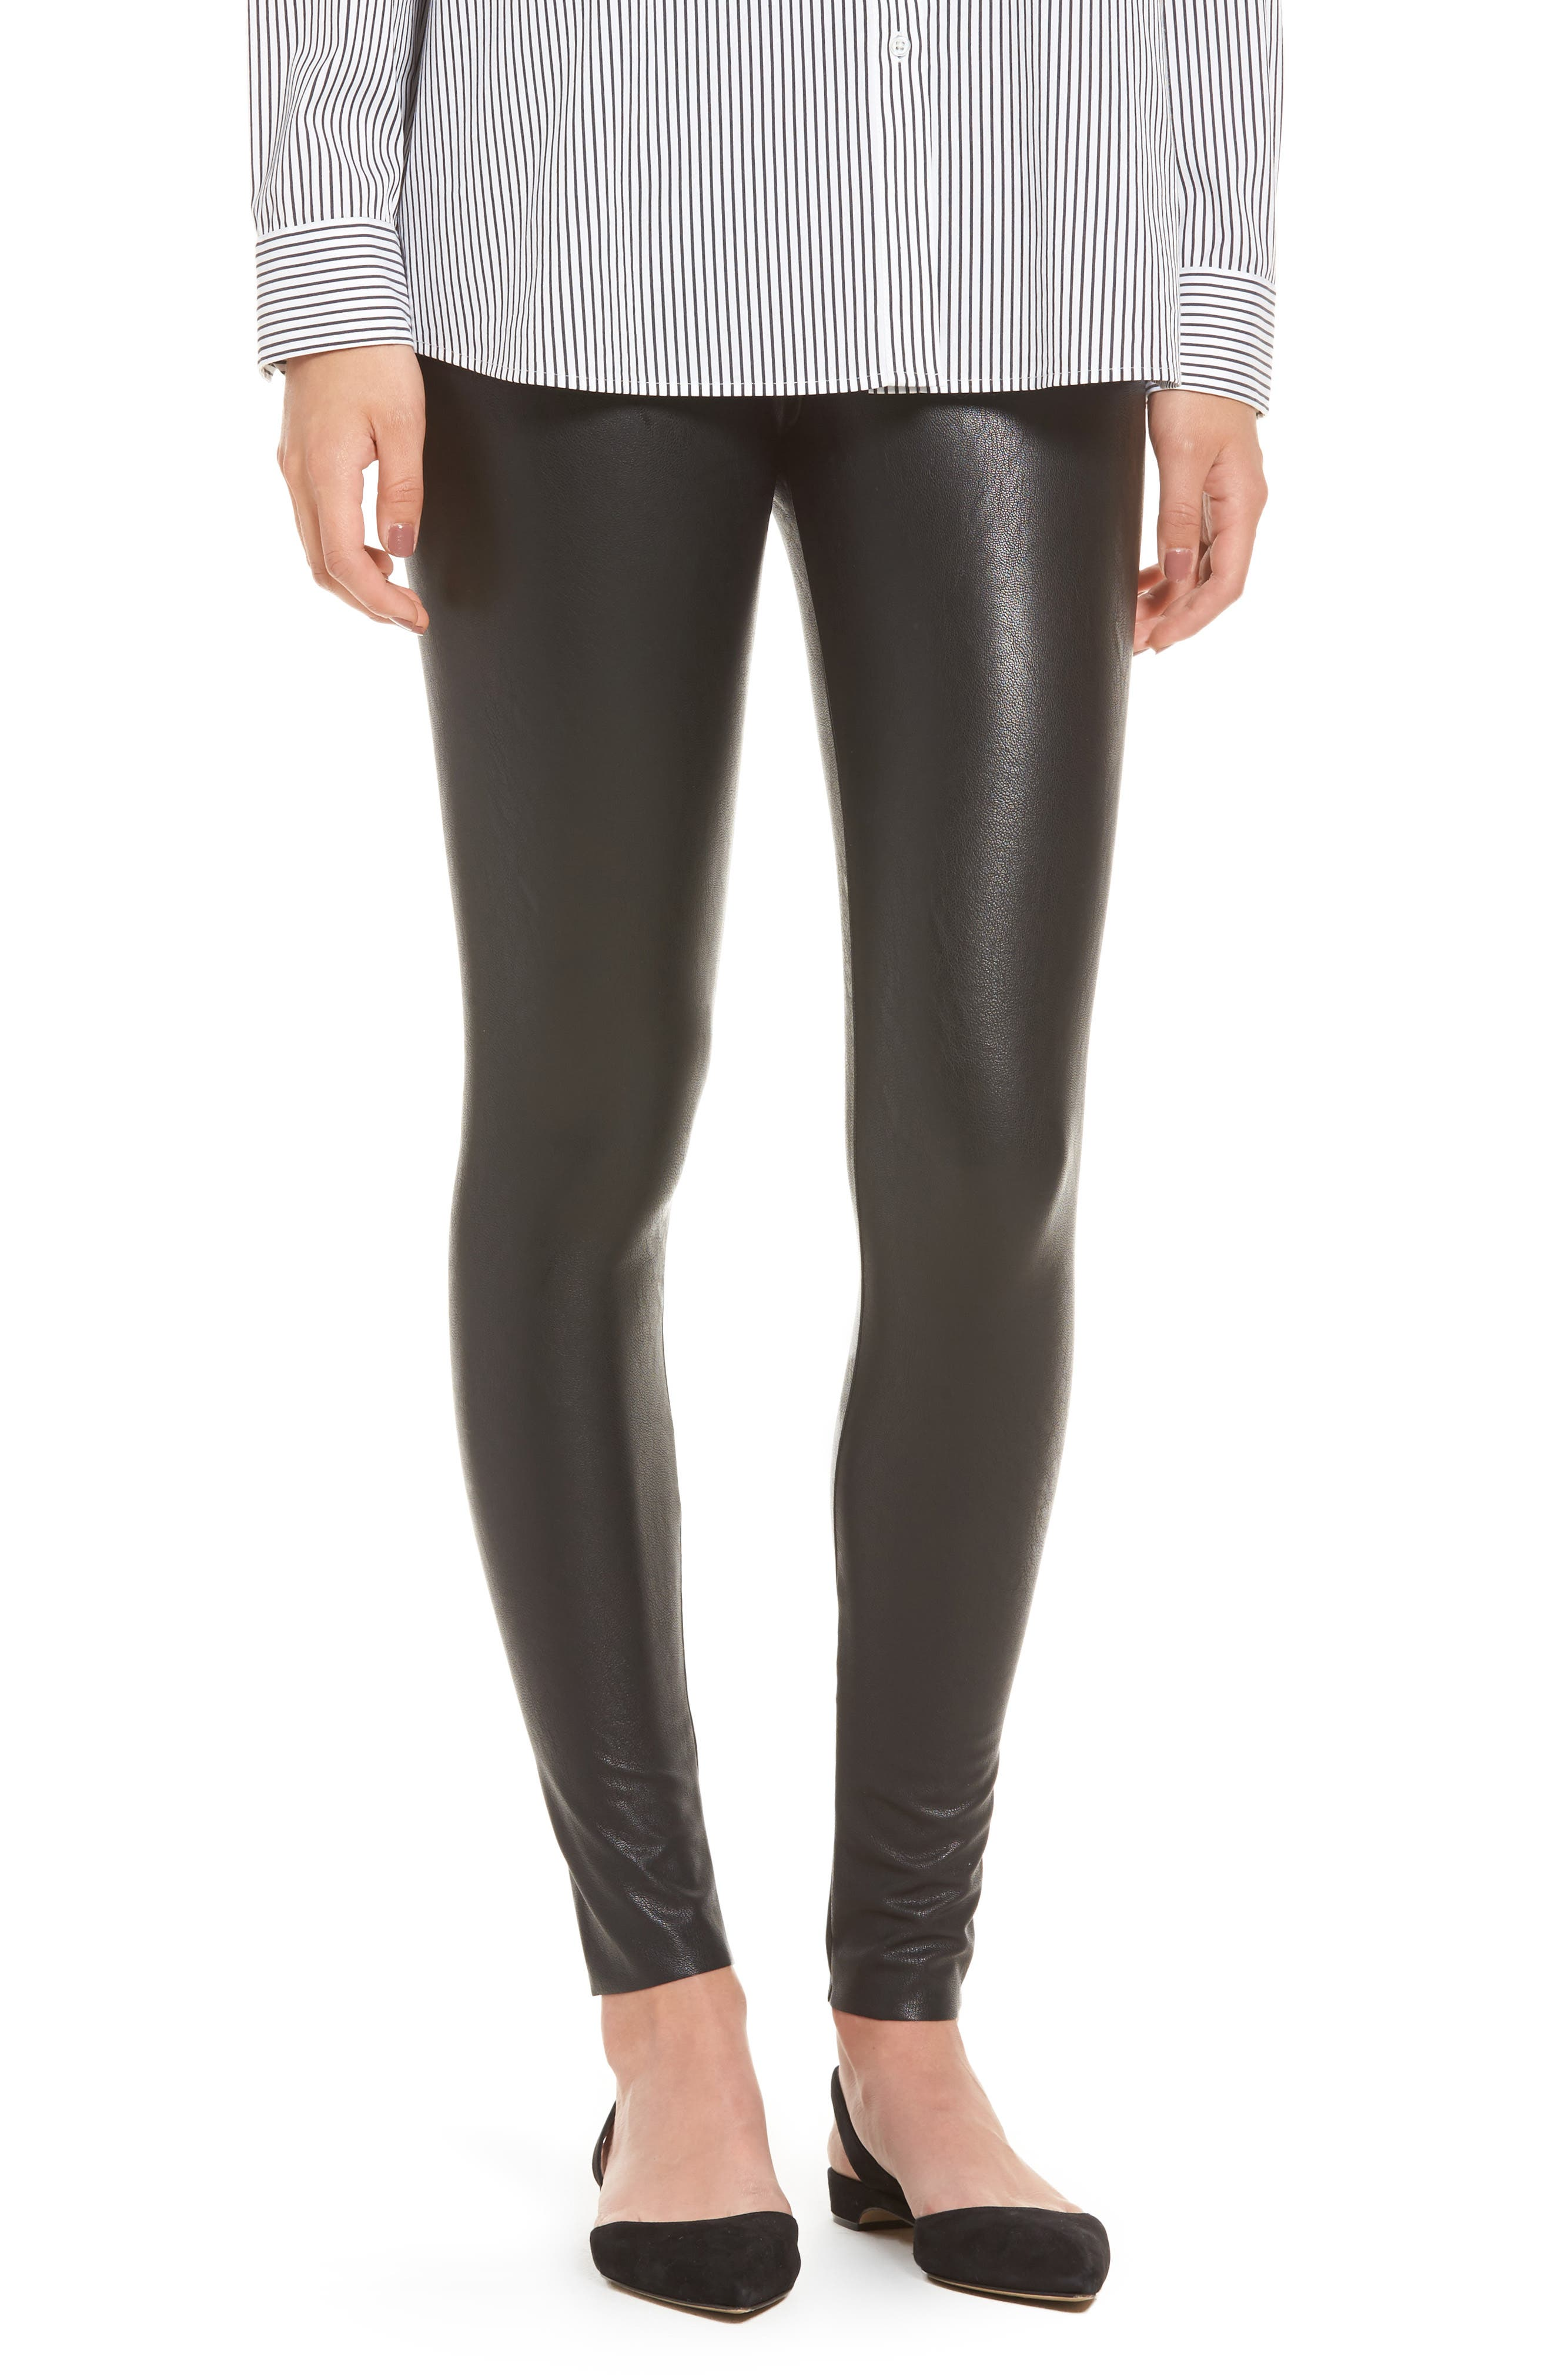 COMMANDO, Perfect Control Faux Leather Leggings, Main thumbnail 1, color, BLACK